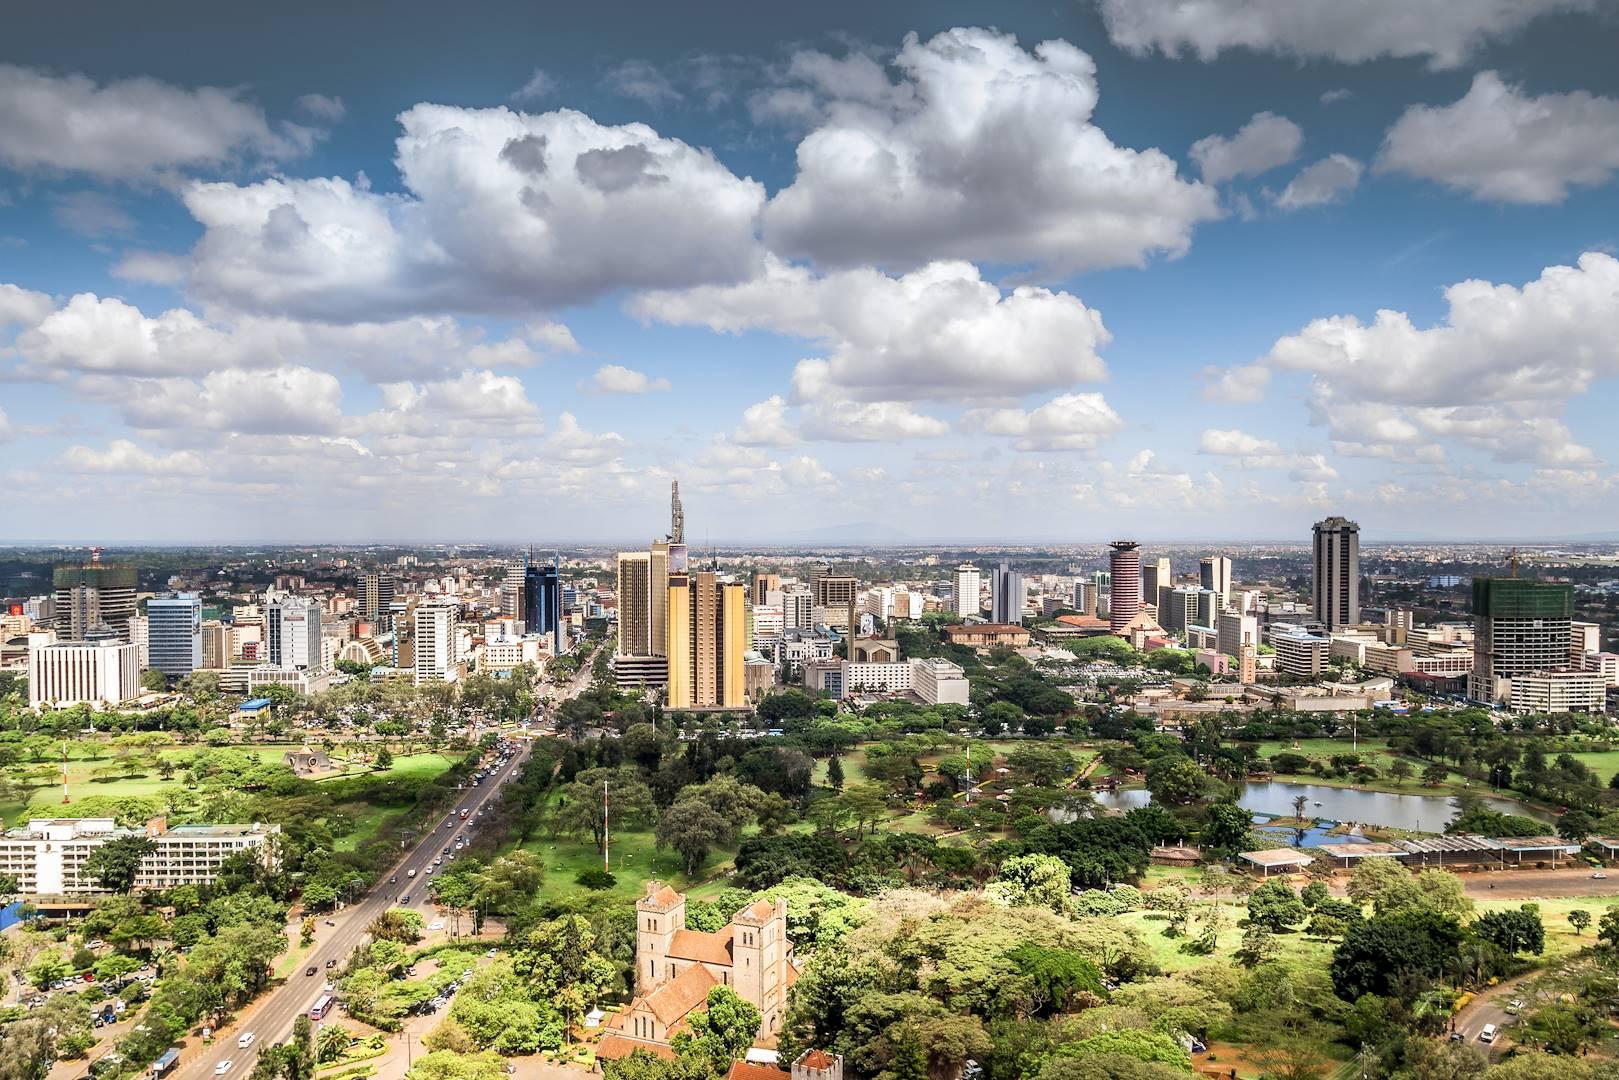 Sites de rencontre au Kenya Nairobi